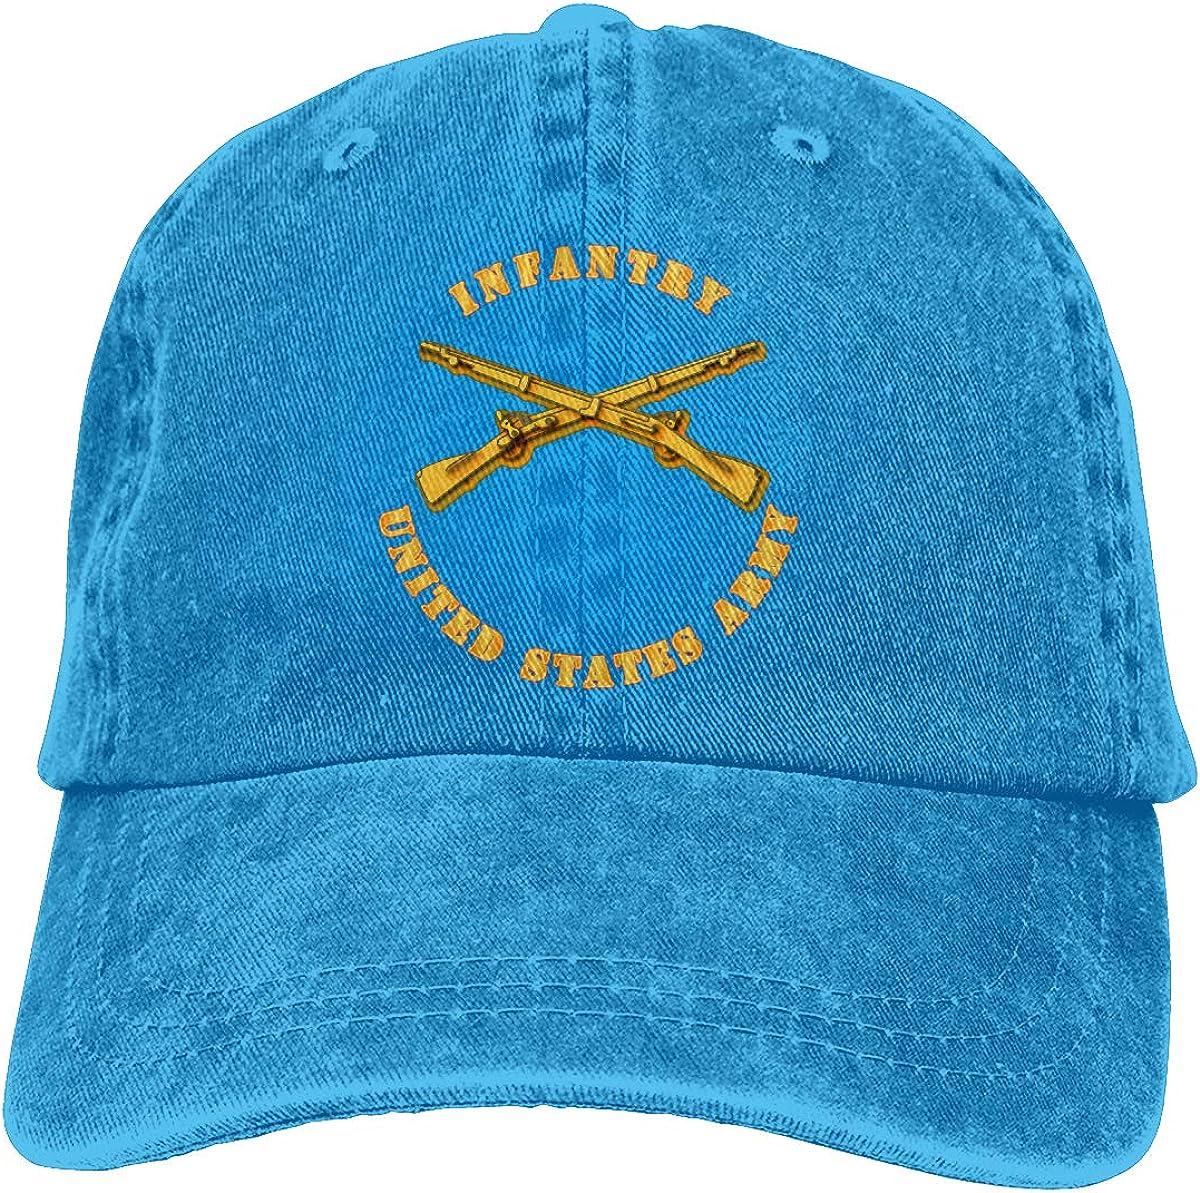 Army Infantry Adjustable Baseball Caps Denim Hats Cowboy Sport Outdoor